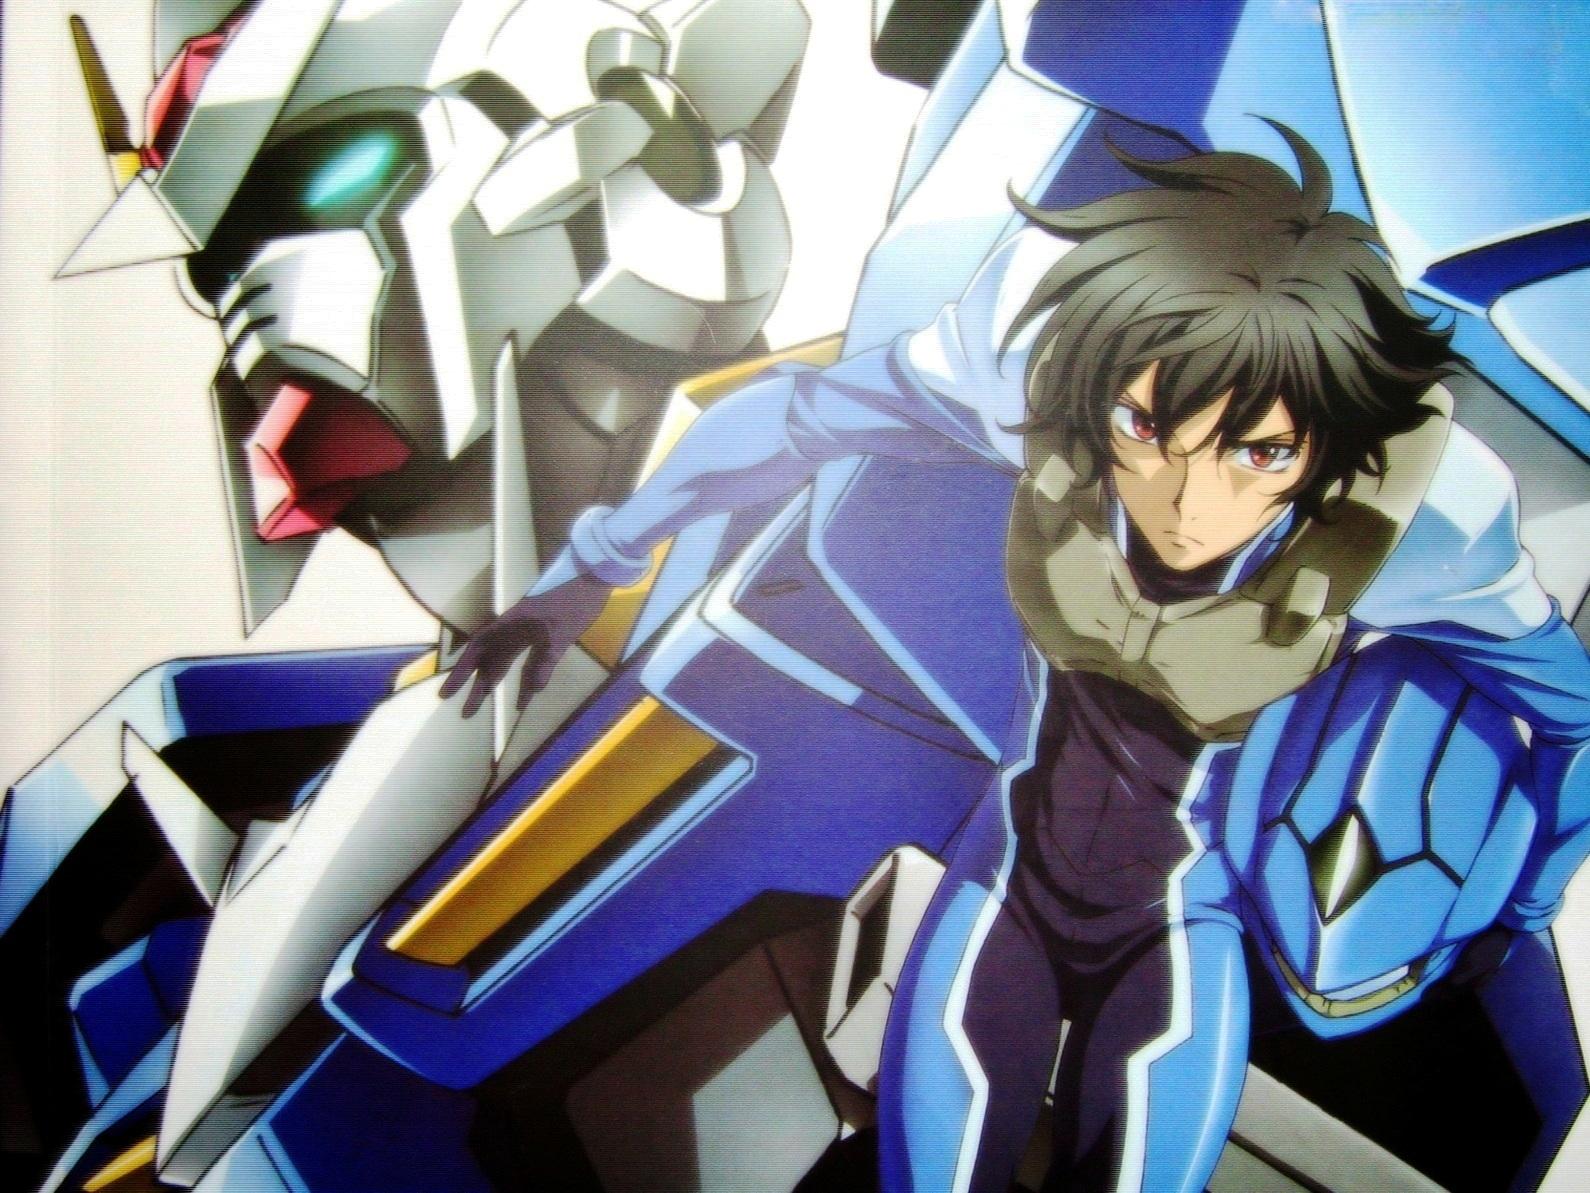 Setsuna F. Seiei - Mobile Suit Gundam 00 - Image #115418 ...